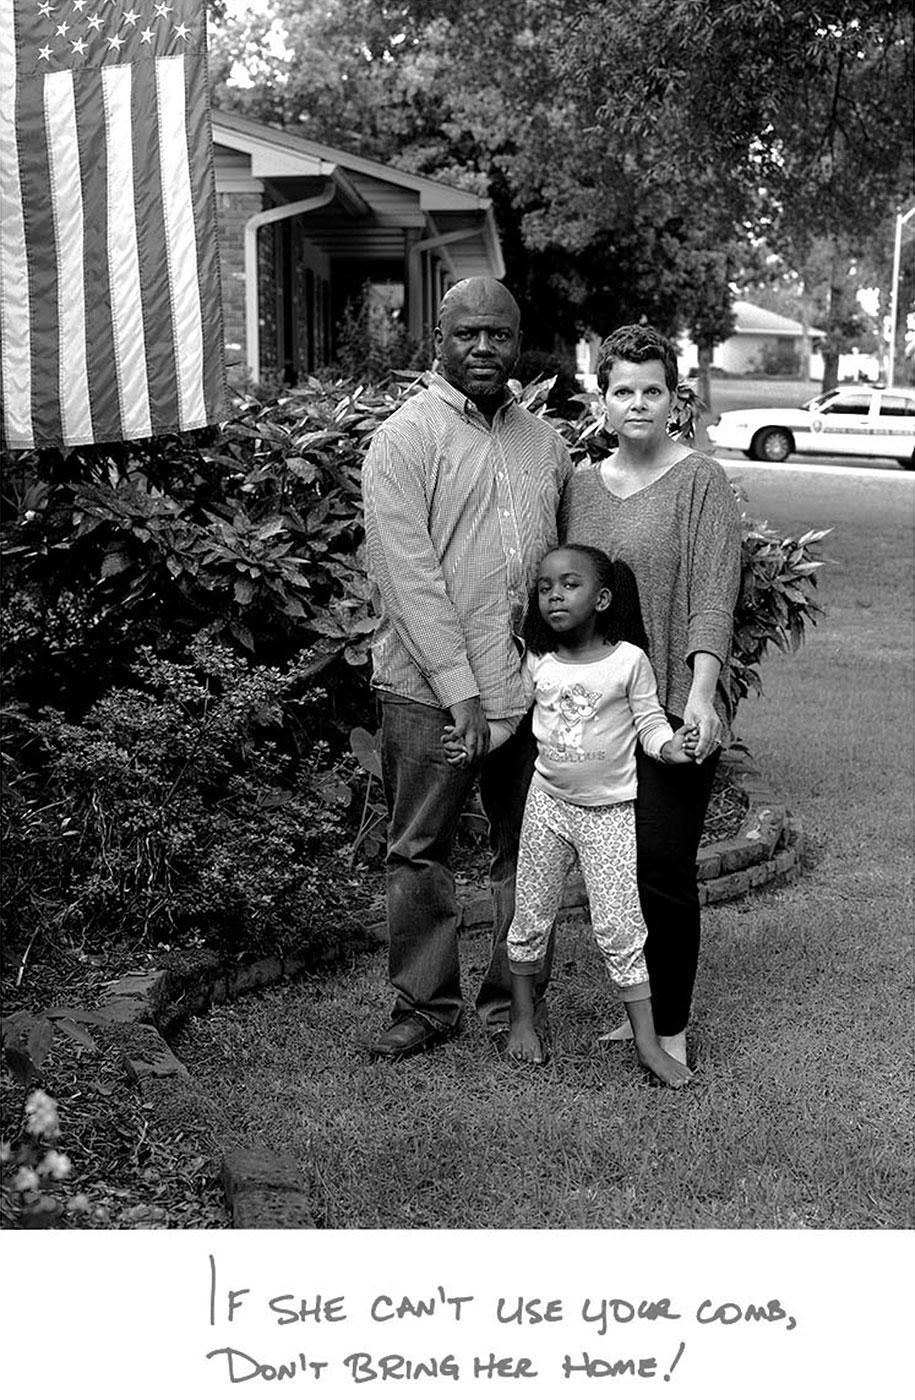 interracial-couples-racist-taunts-sticks-stones-donna-pinckley-13